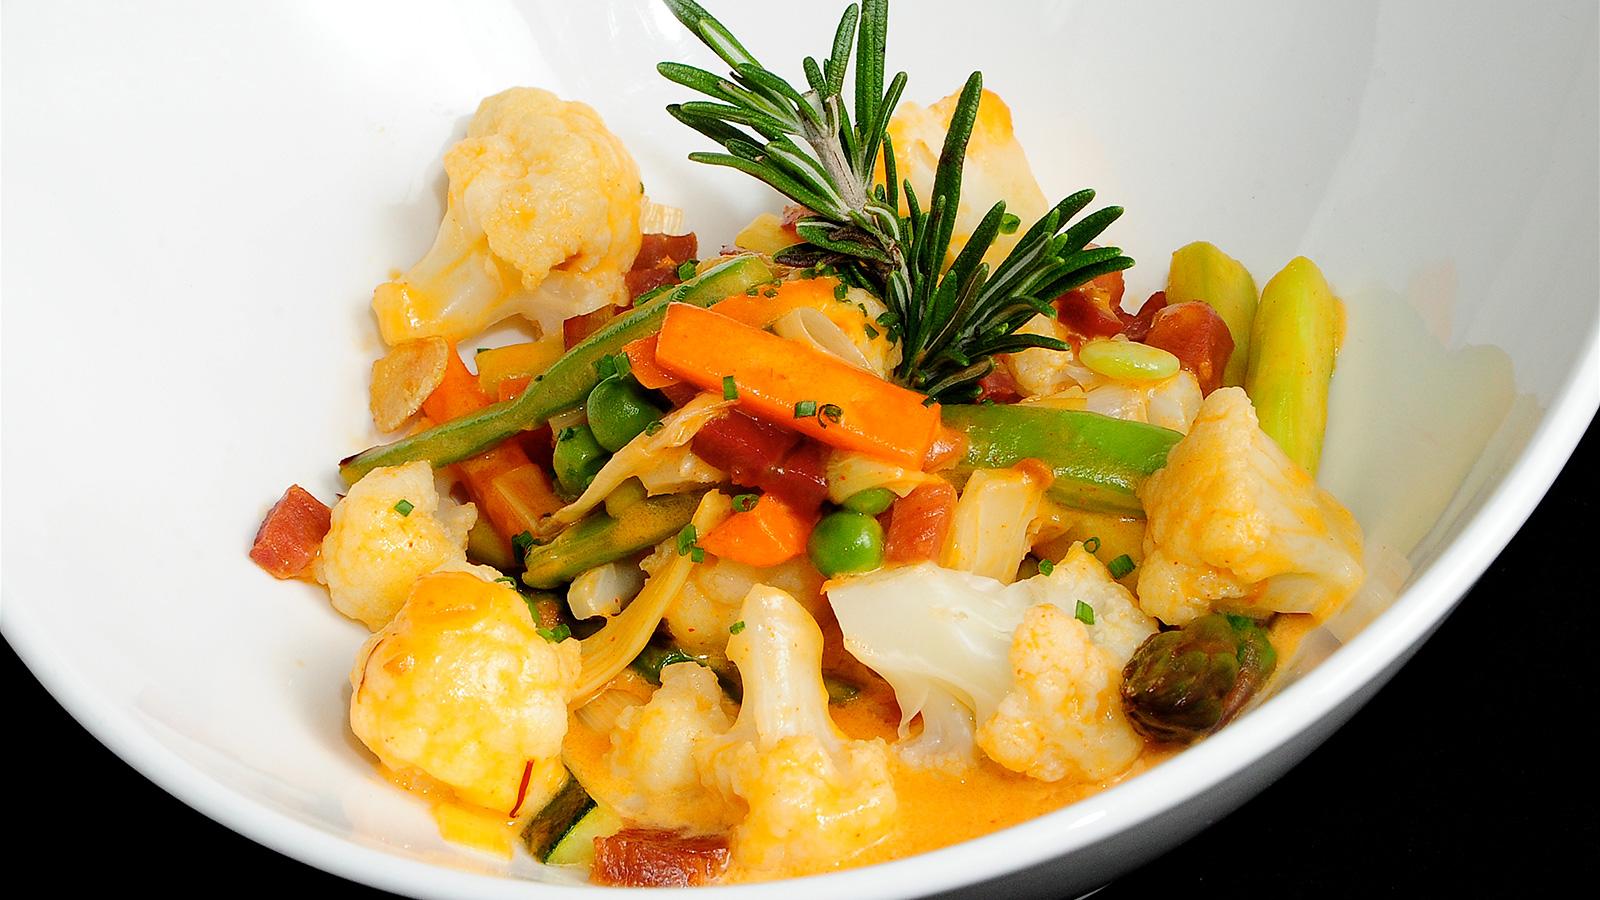 Menestra de verduras al cava chema de isidro v zquez for Chema de isidro canal cocina